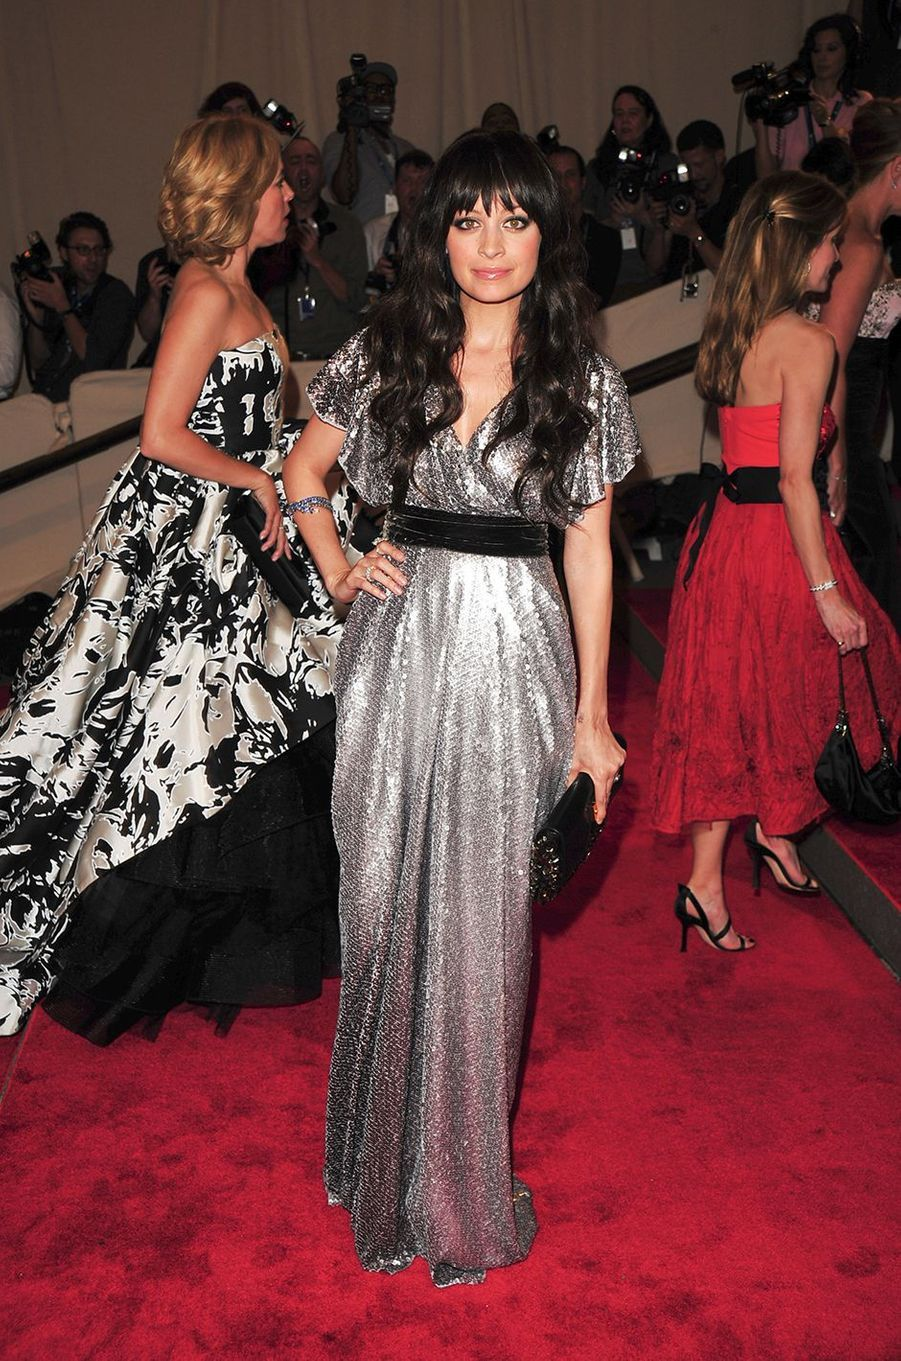 Nicole Richieau Met Gala à New York le 3 mai 2010